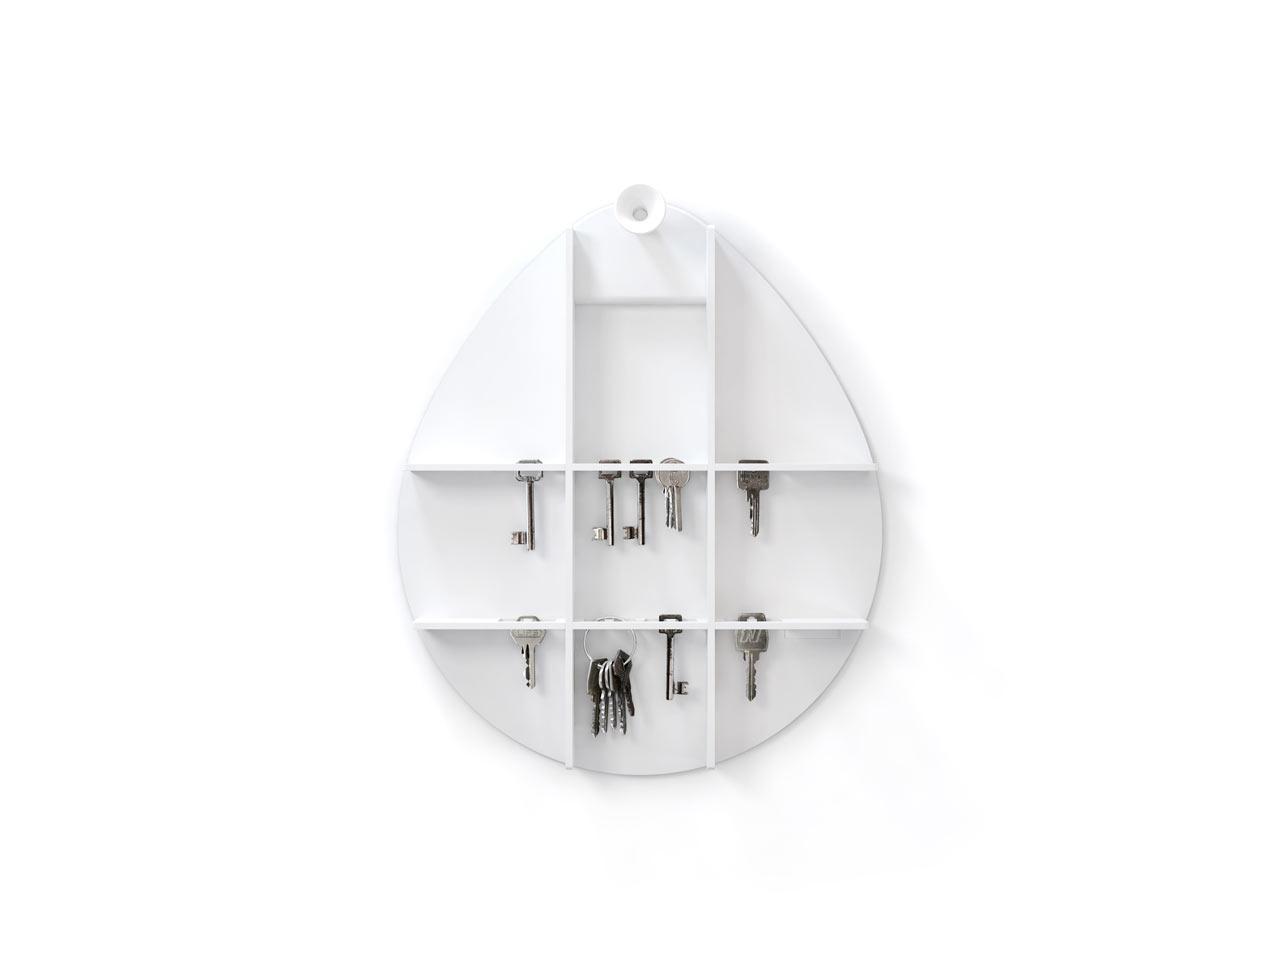 The-Cabinet-Key-Cupboard-RiZZ-Teun-Fleskens-2